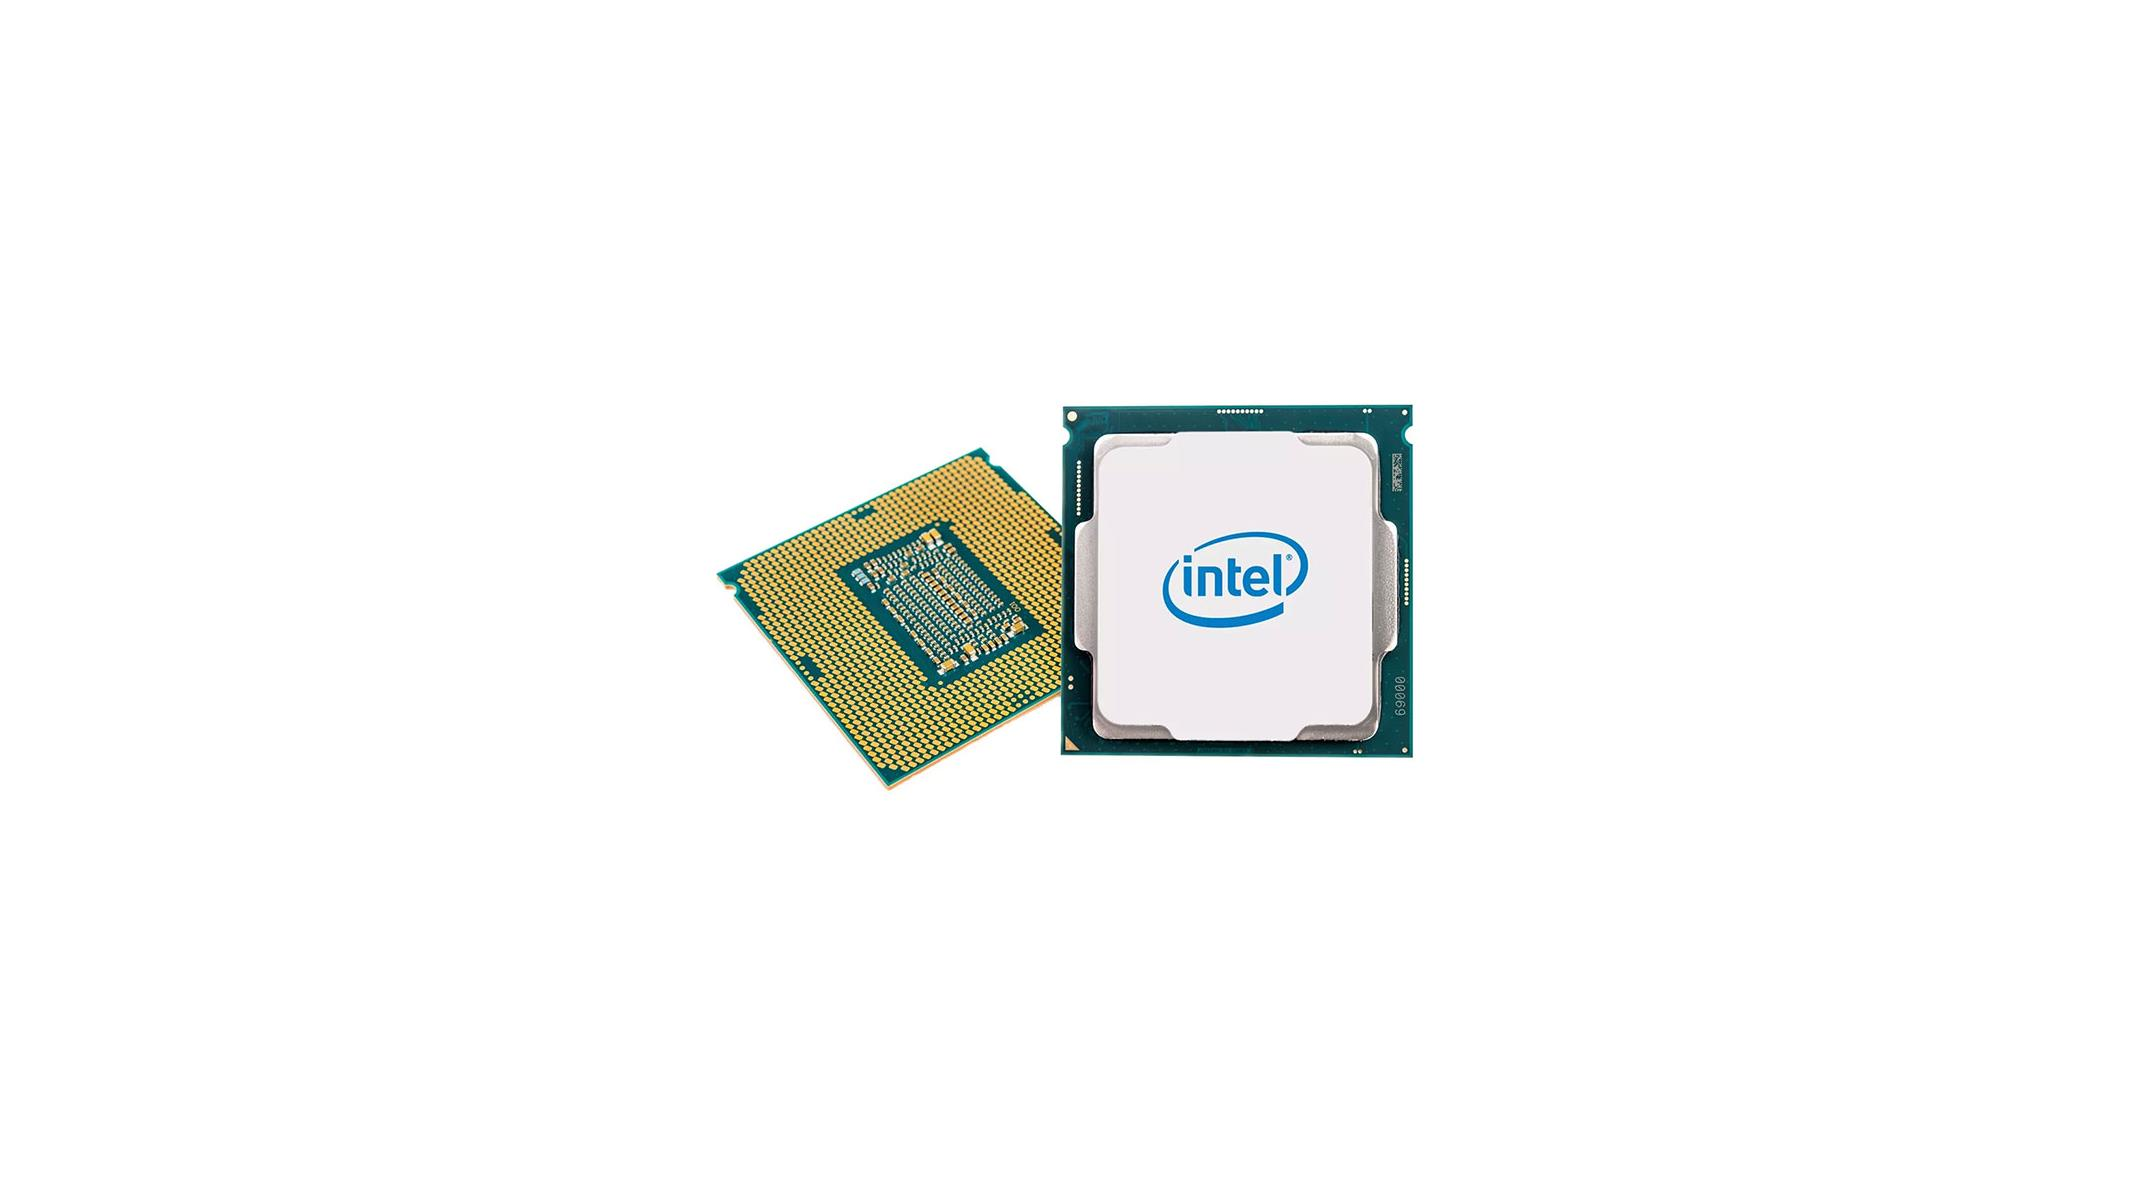 Comet Lake-S 10-Core Desktop CPUs Confirmed For Q1 2020 In